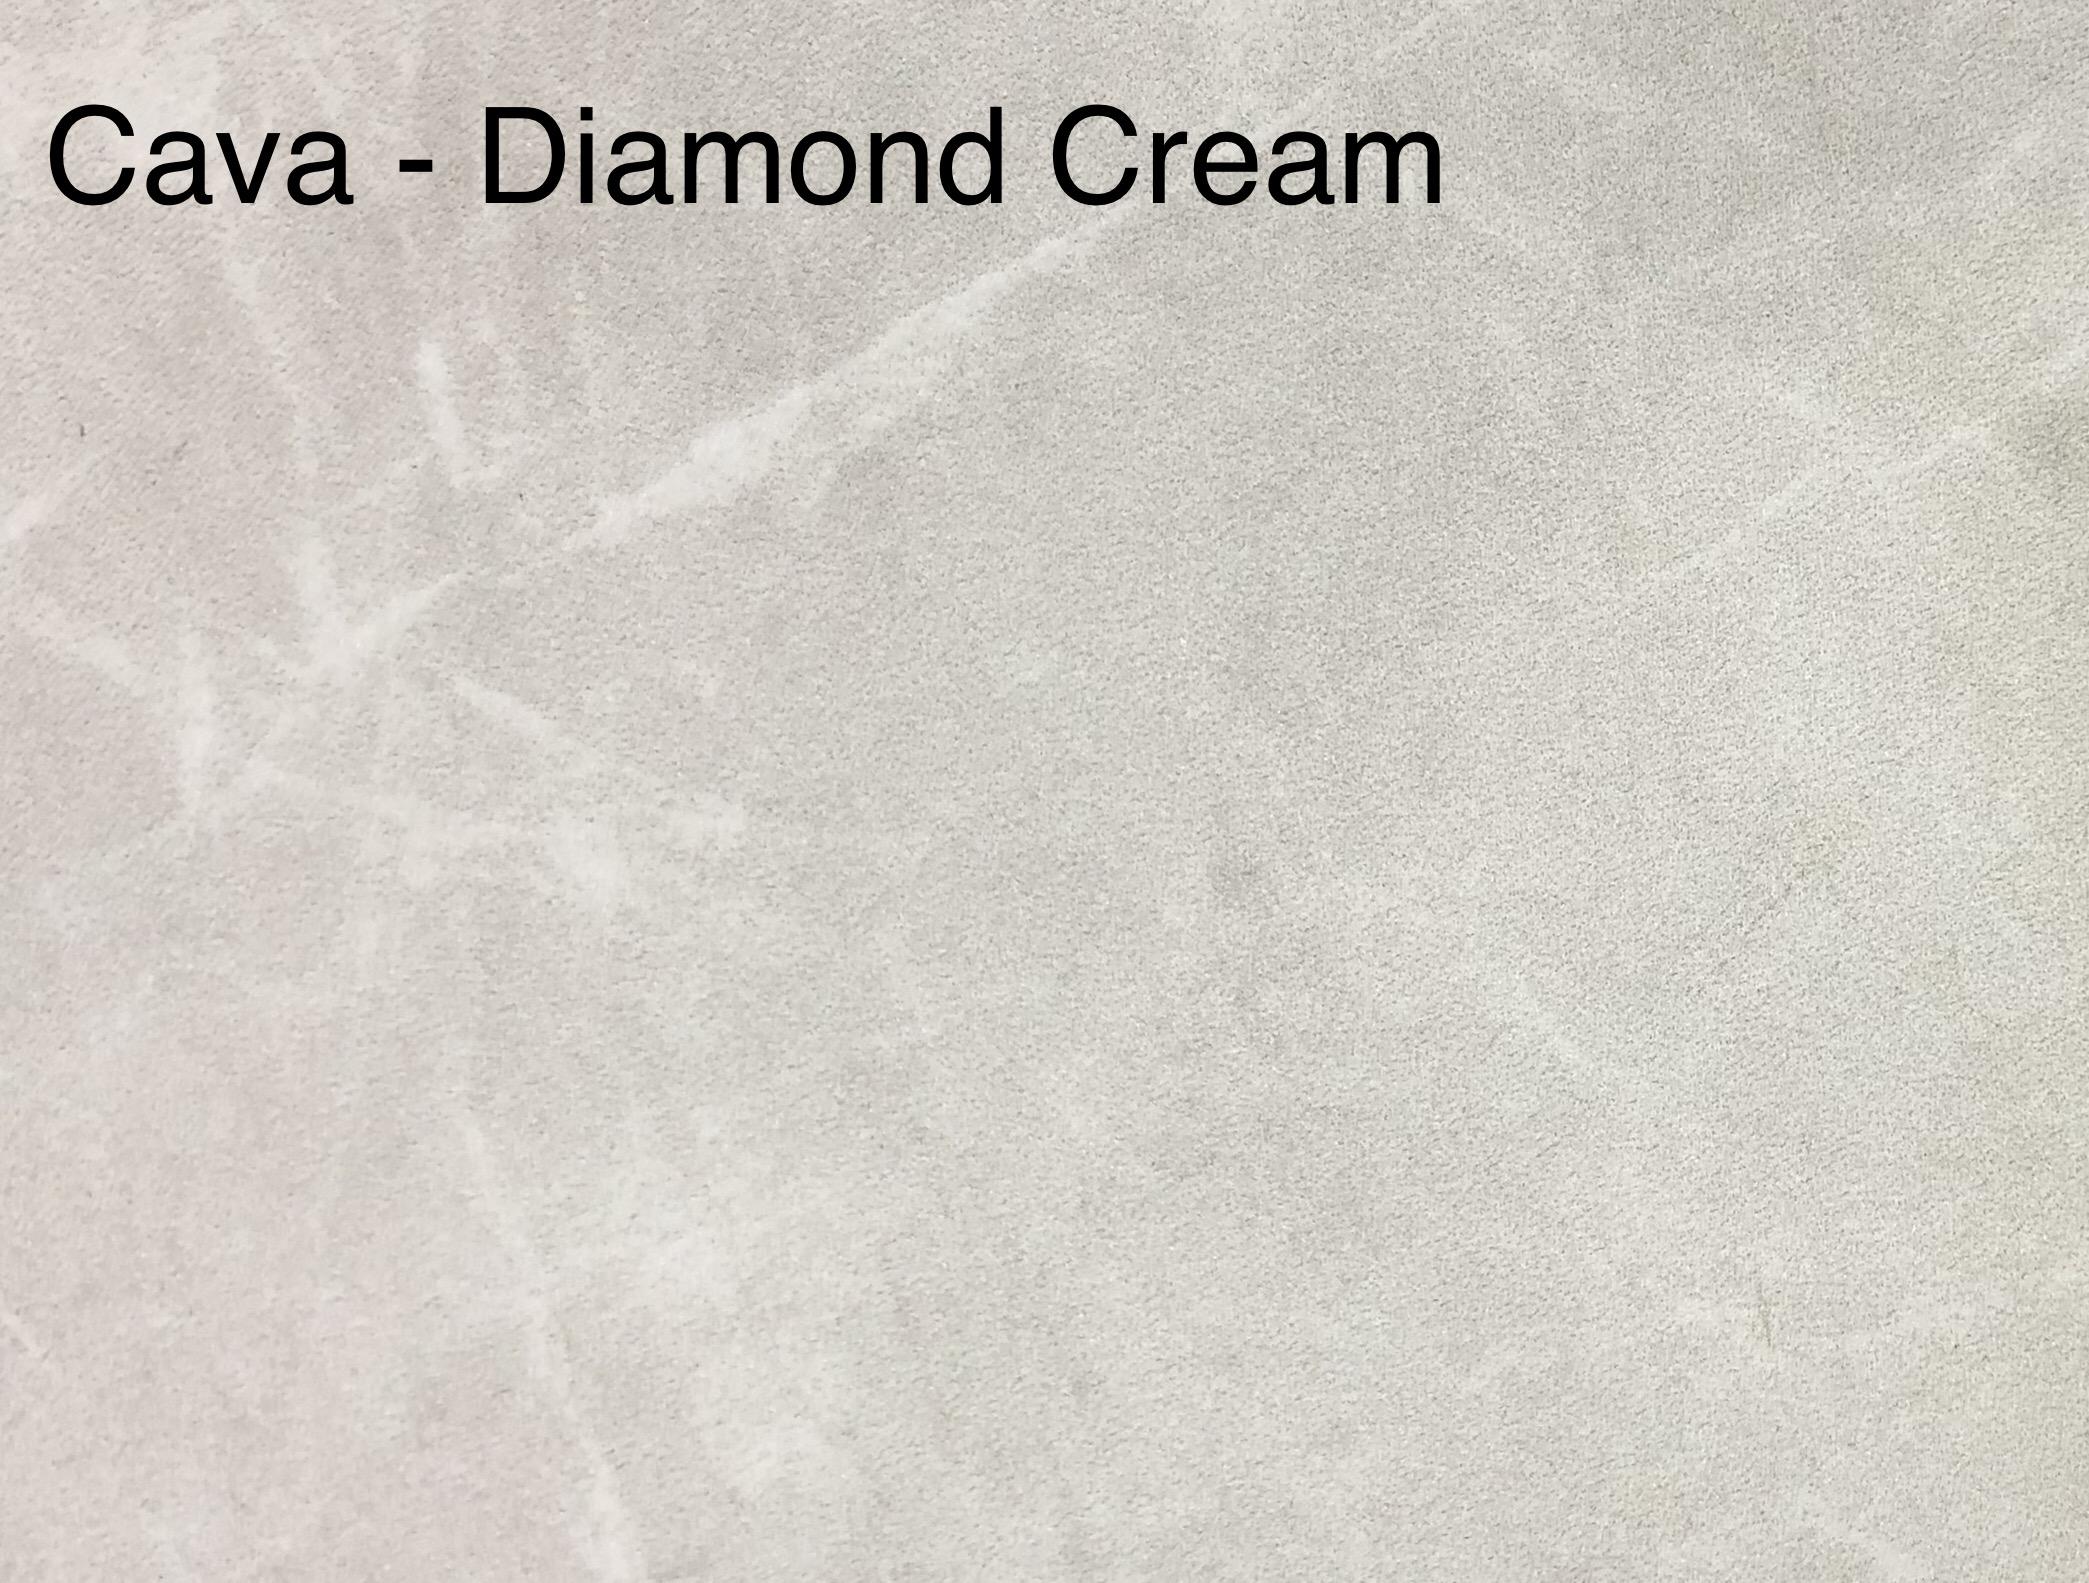 CAVA - DIAMOND CREAM